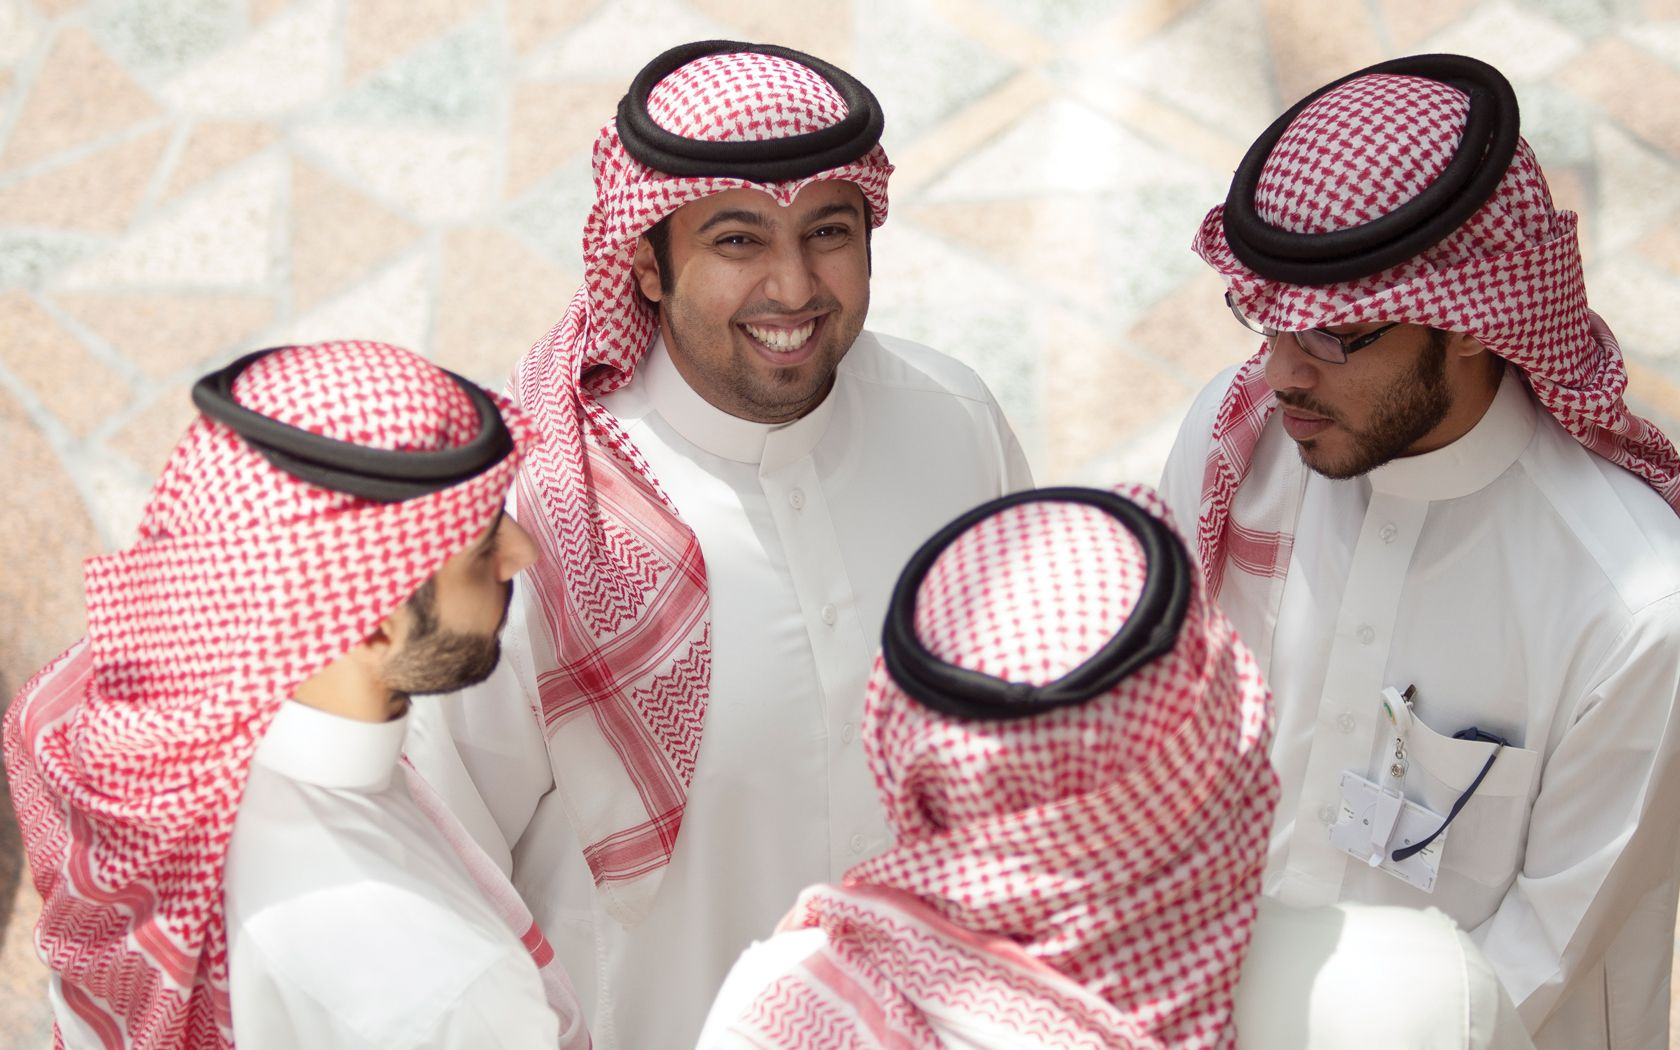 Saudi Hollandi Bank  See gather.london for more